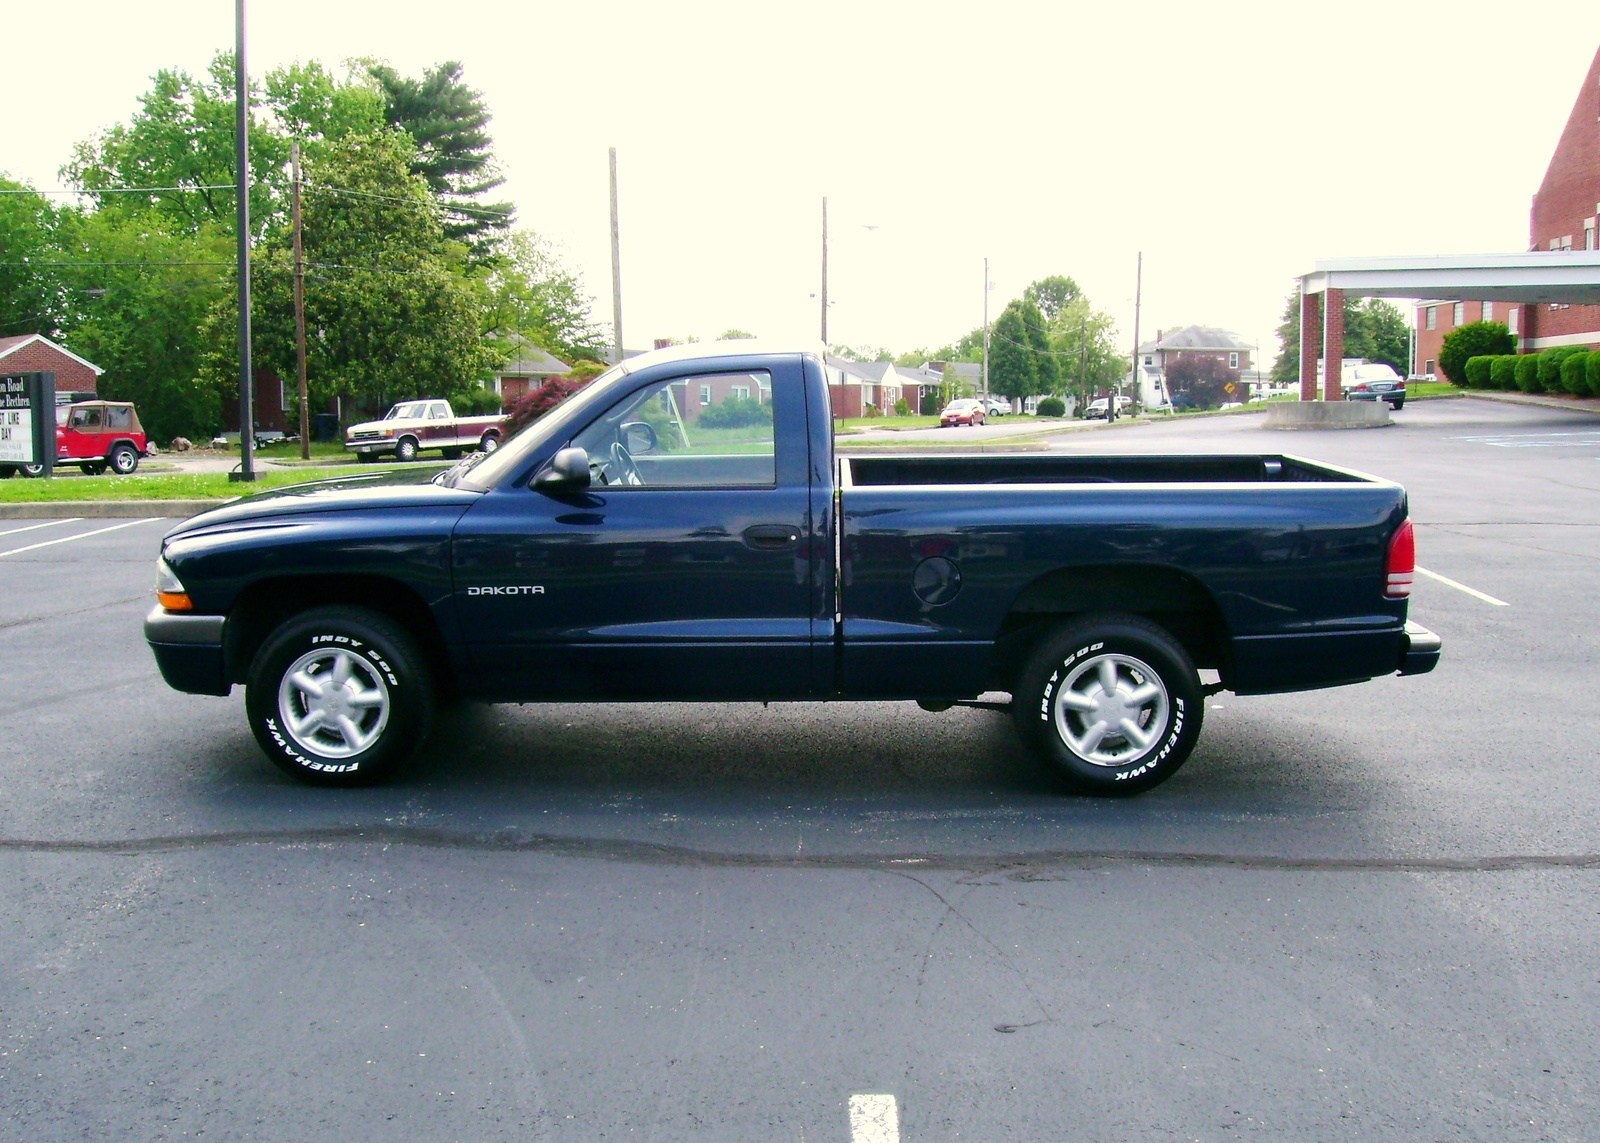 Dodge Dakota Questions - Why won't my truck start? - CarGurus